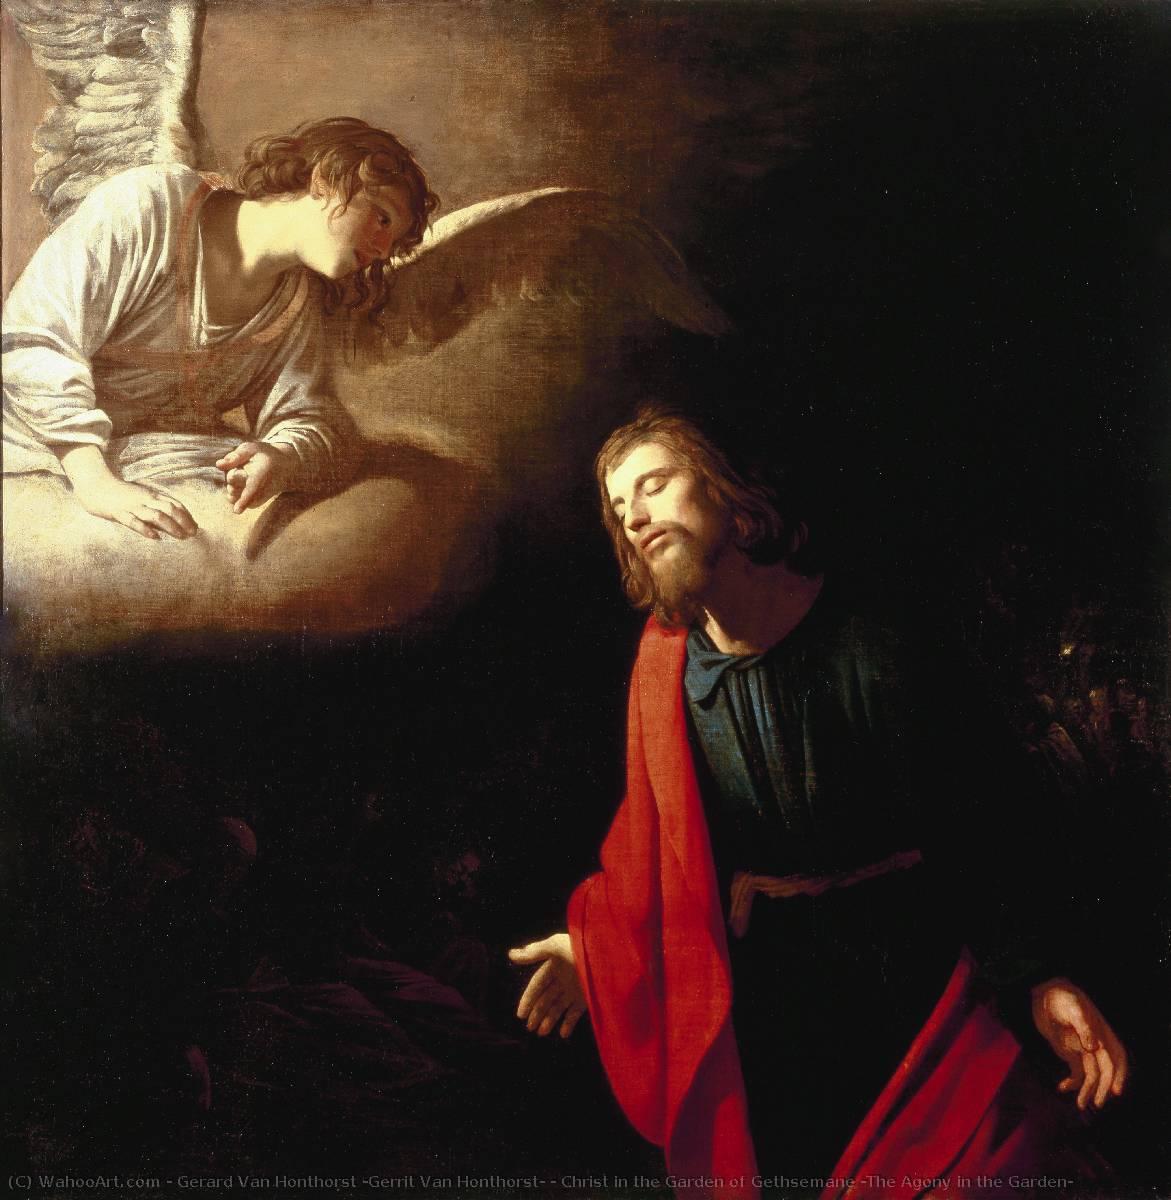 http://es.wahooart.com/Art.nsf/O/8BWQLY/$File/Gerard-van-Honthorst-Gerrit-van-Honthorst-Christ-in-the-Garden-of-Gethsemane-The...-in-the-Garden-.JPG